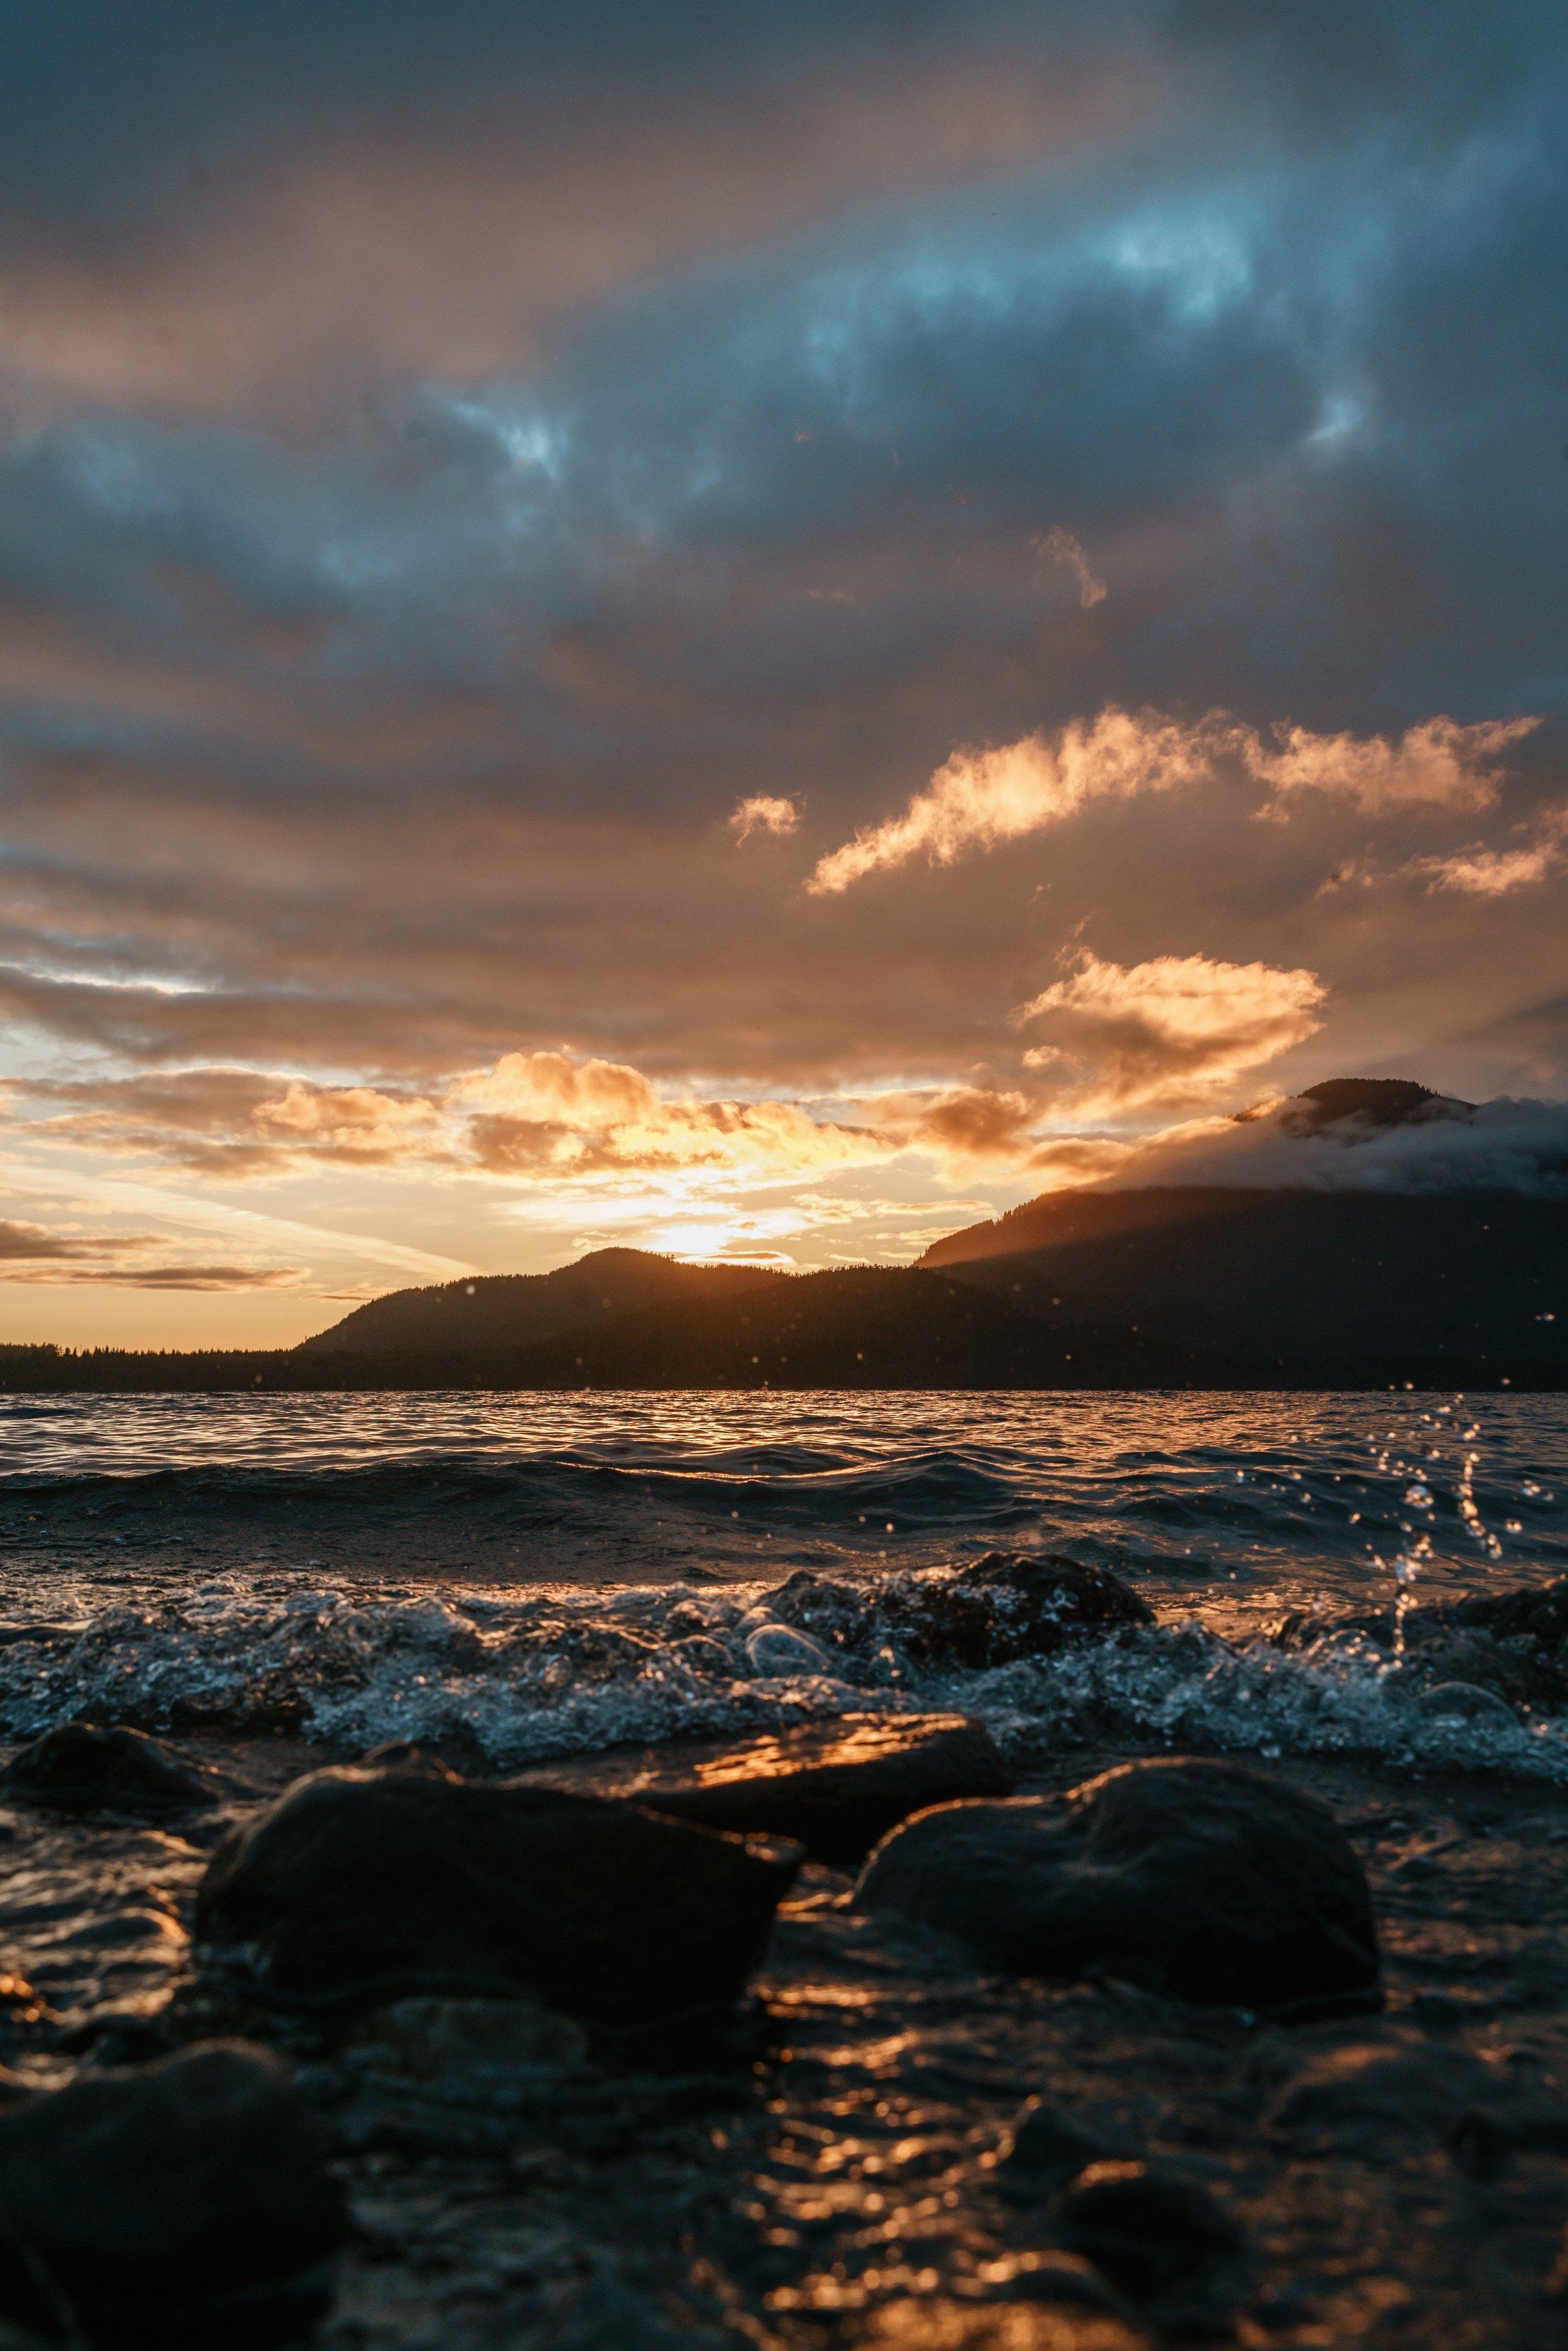 sunset-on-rocky-beach_4460x4460 (1).jpg